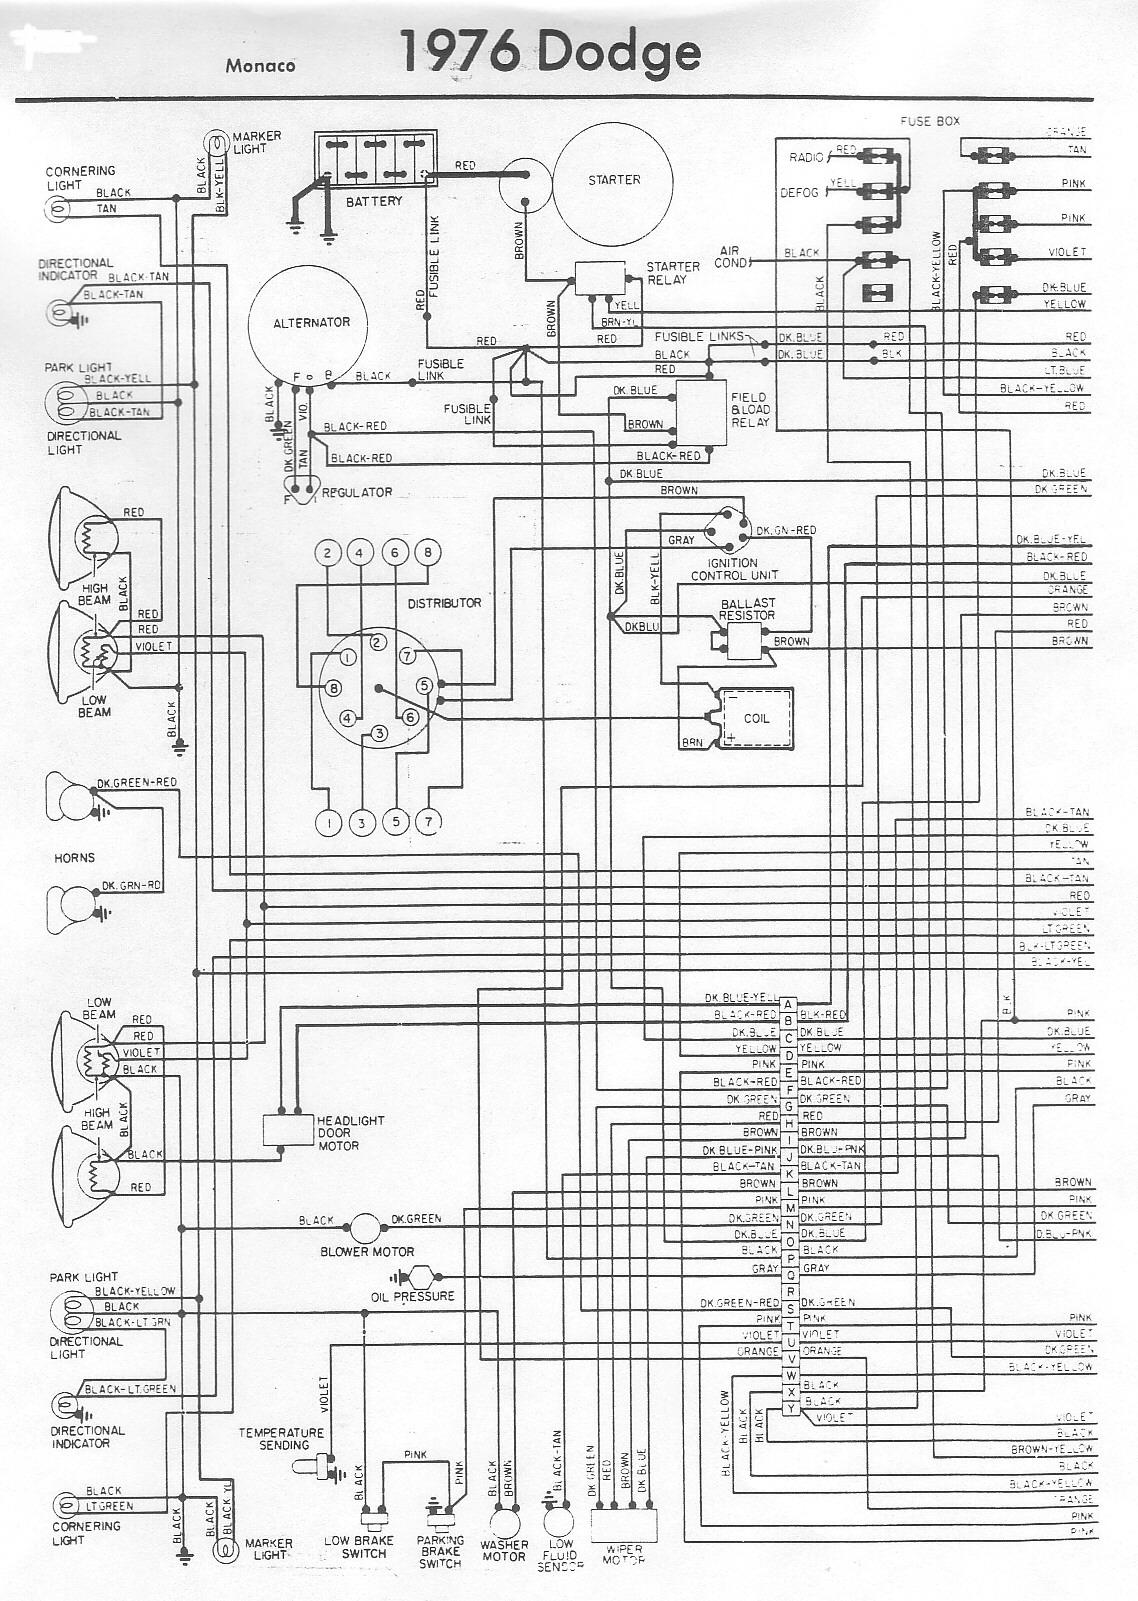 1976 dodge wiring diagram wiring diagram library1976 dodge w200 wiring diagram wiring diagram blogs 1978 dodge motorhome wiring diagram 1976 dodge truck